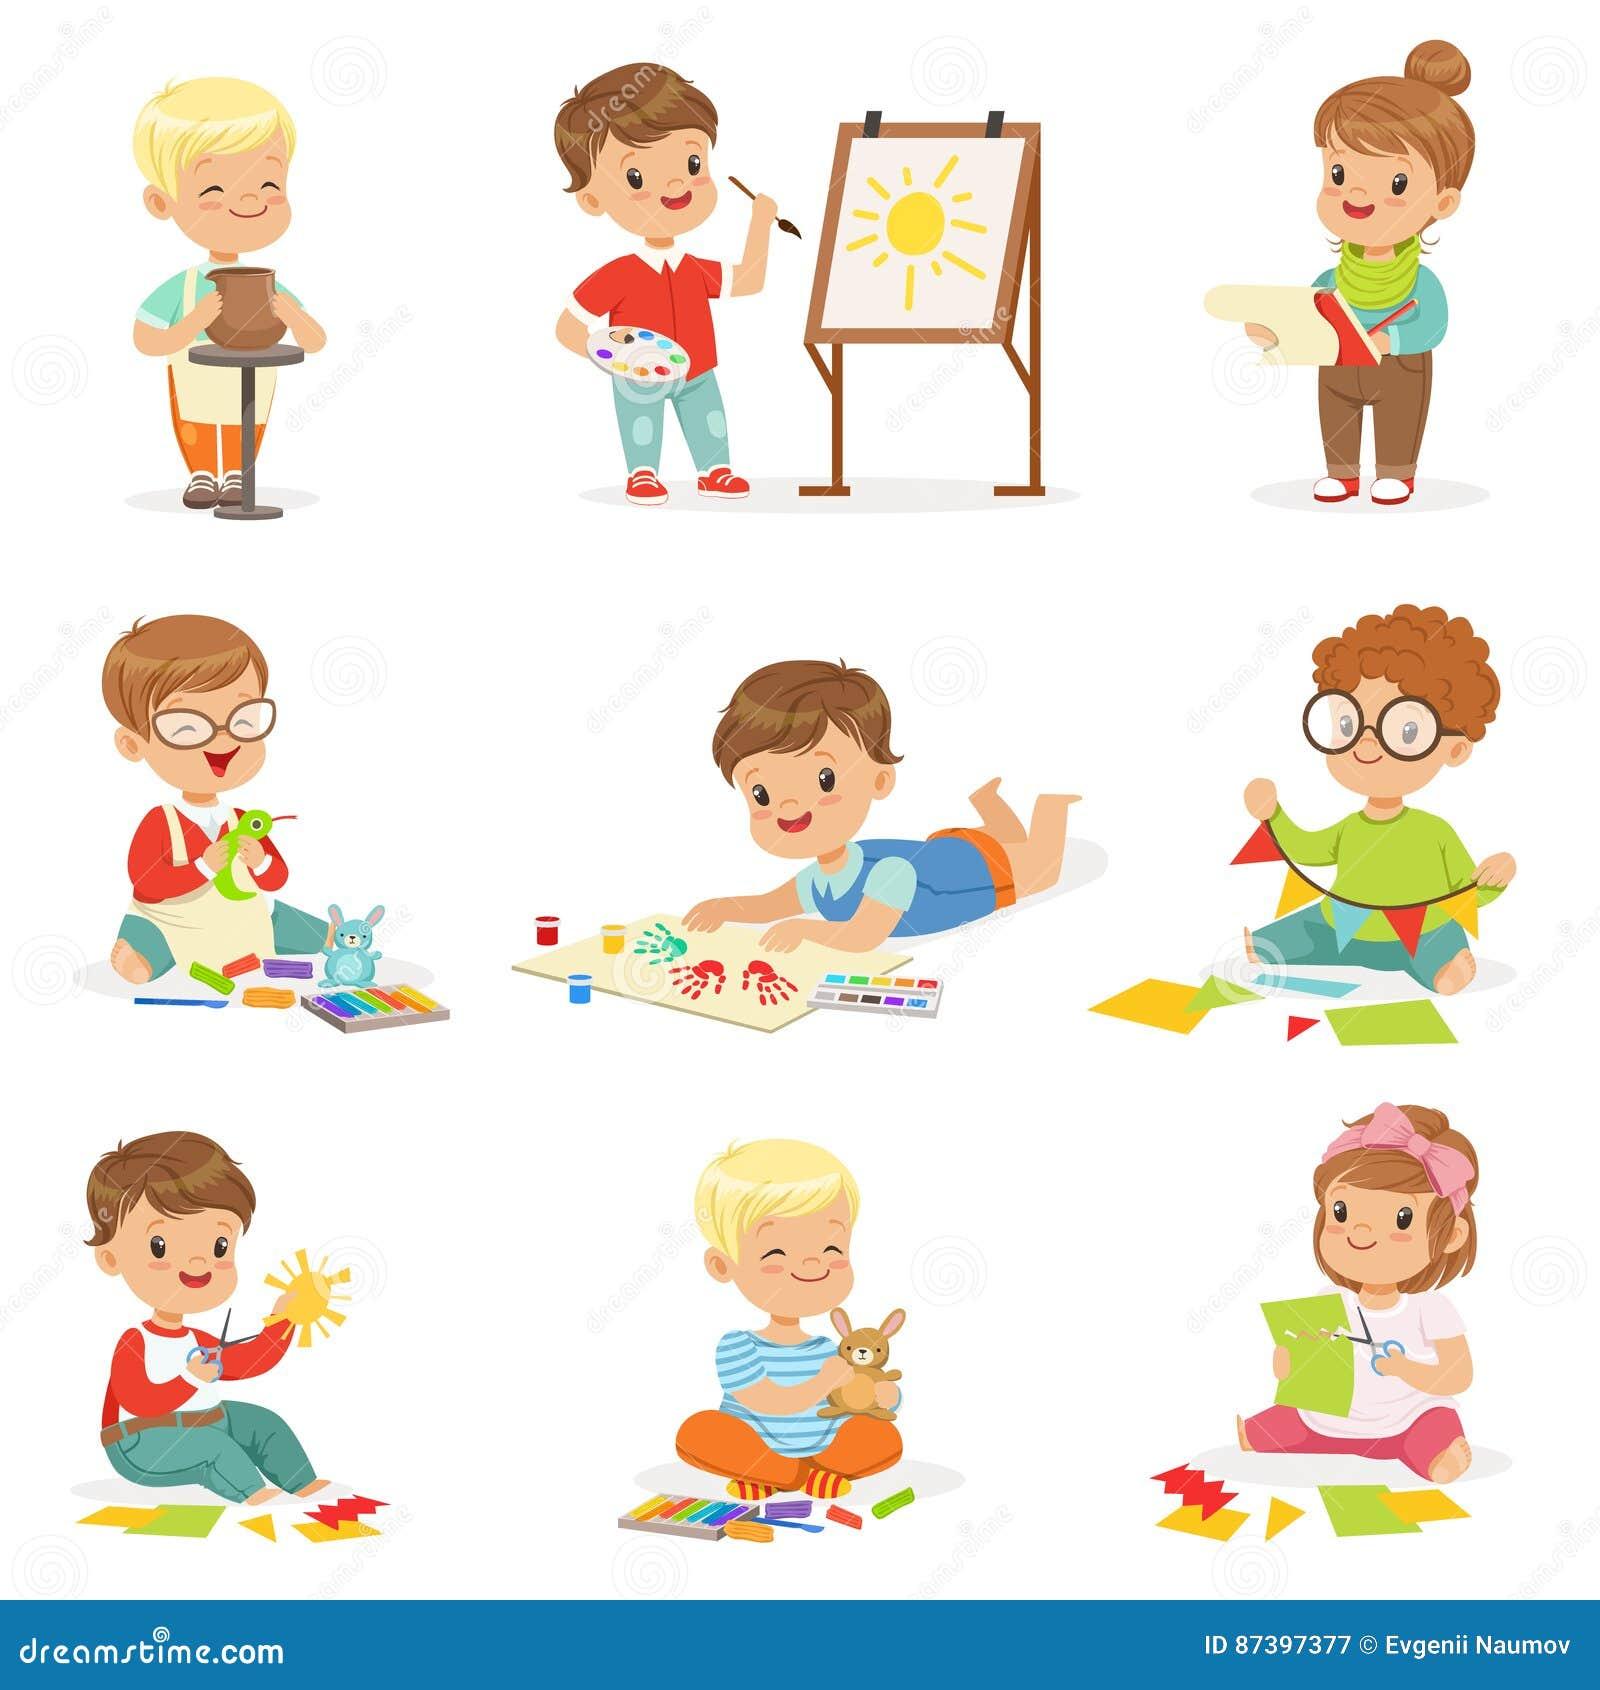 Little Kids In Art Class In School Doing Different Creative